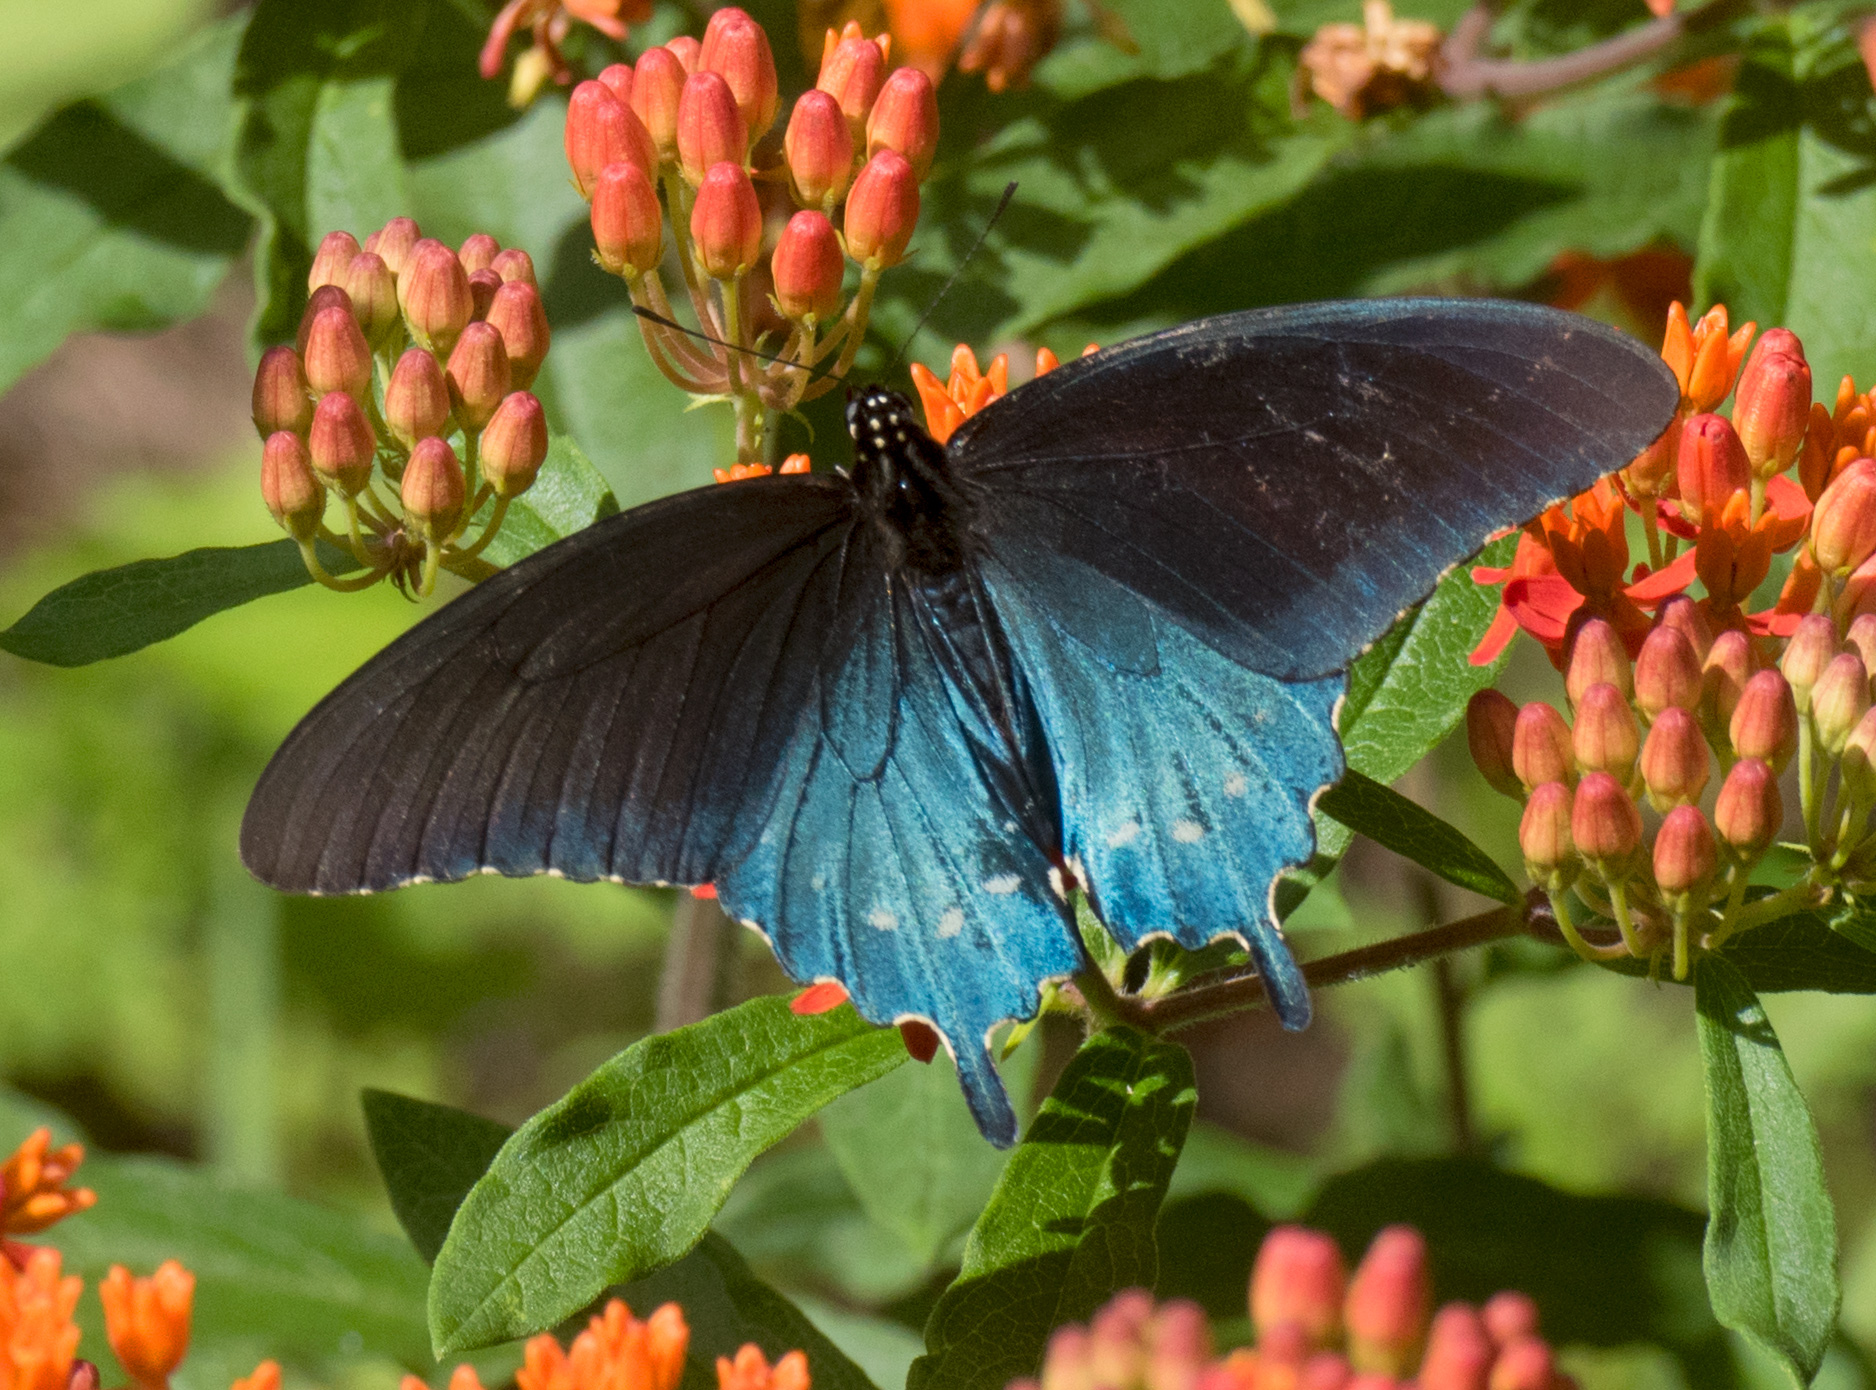 Pipevine Swallowtail Butterfly - Battus philenor - North ... |Pipevine Swallowtail Butterfly